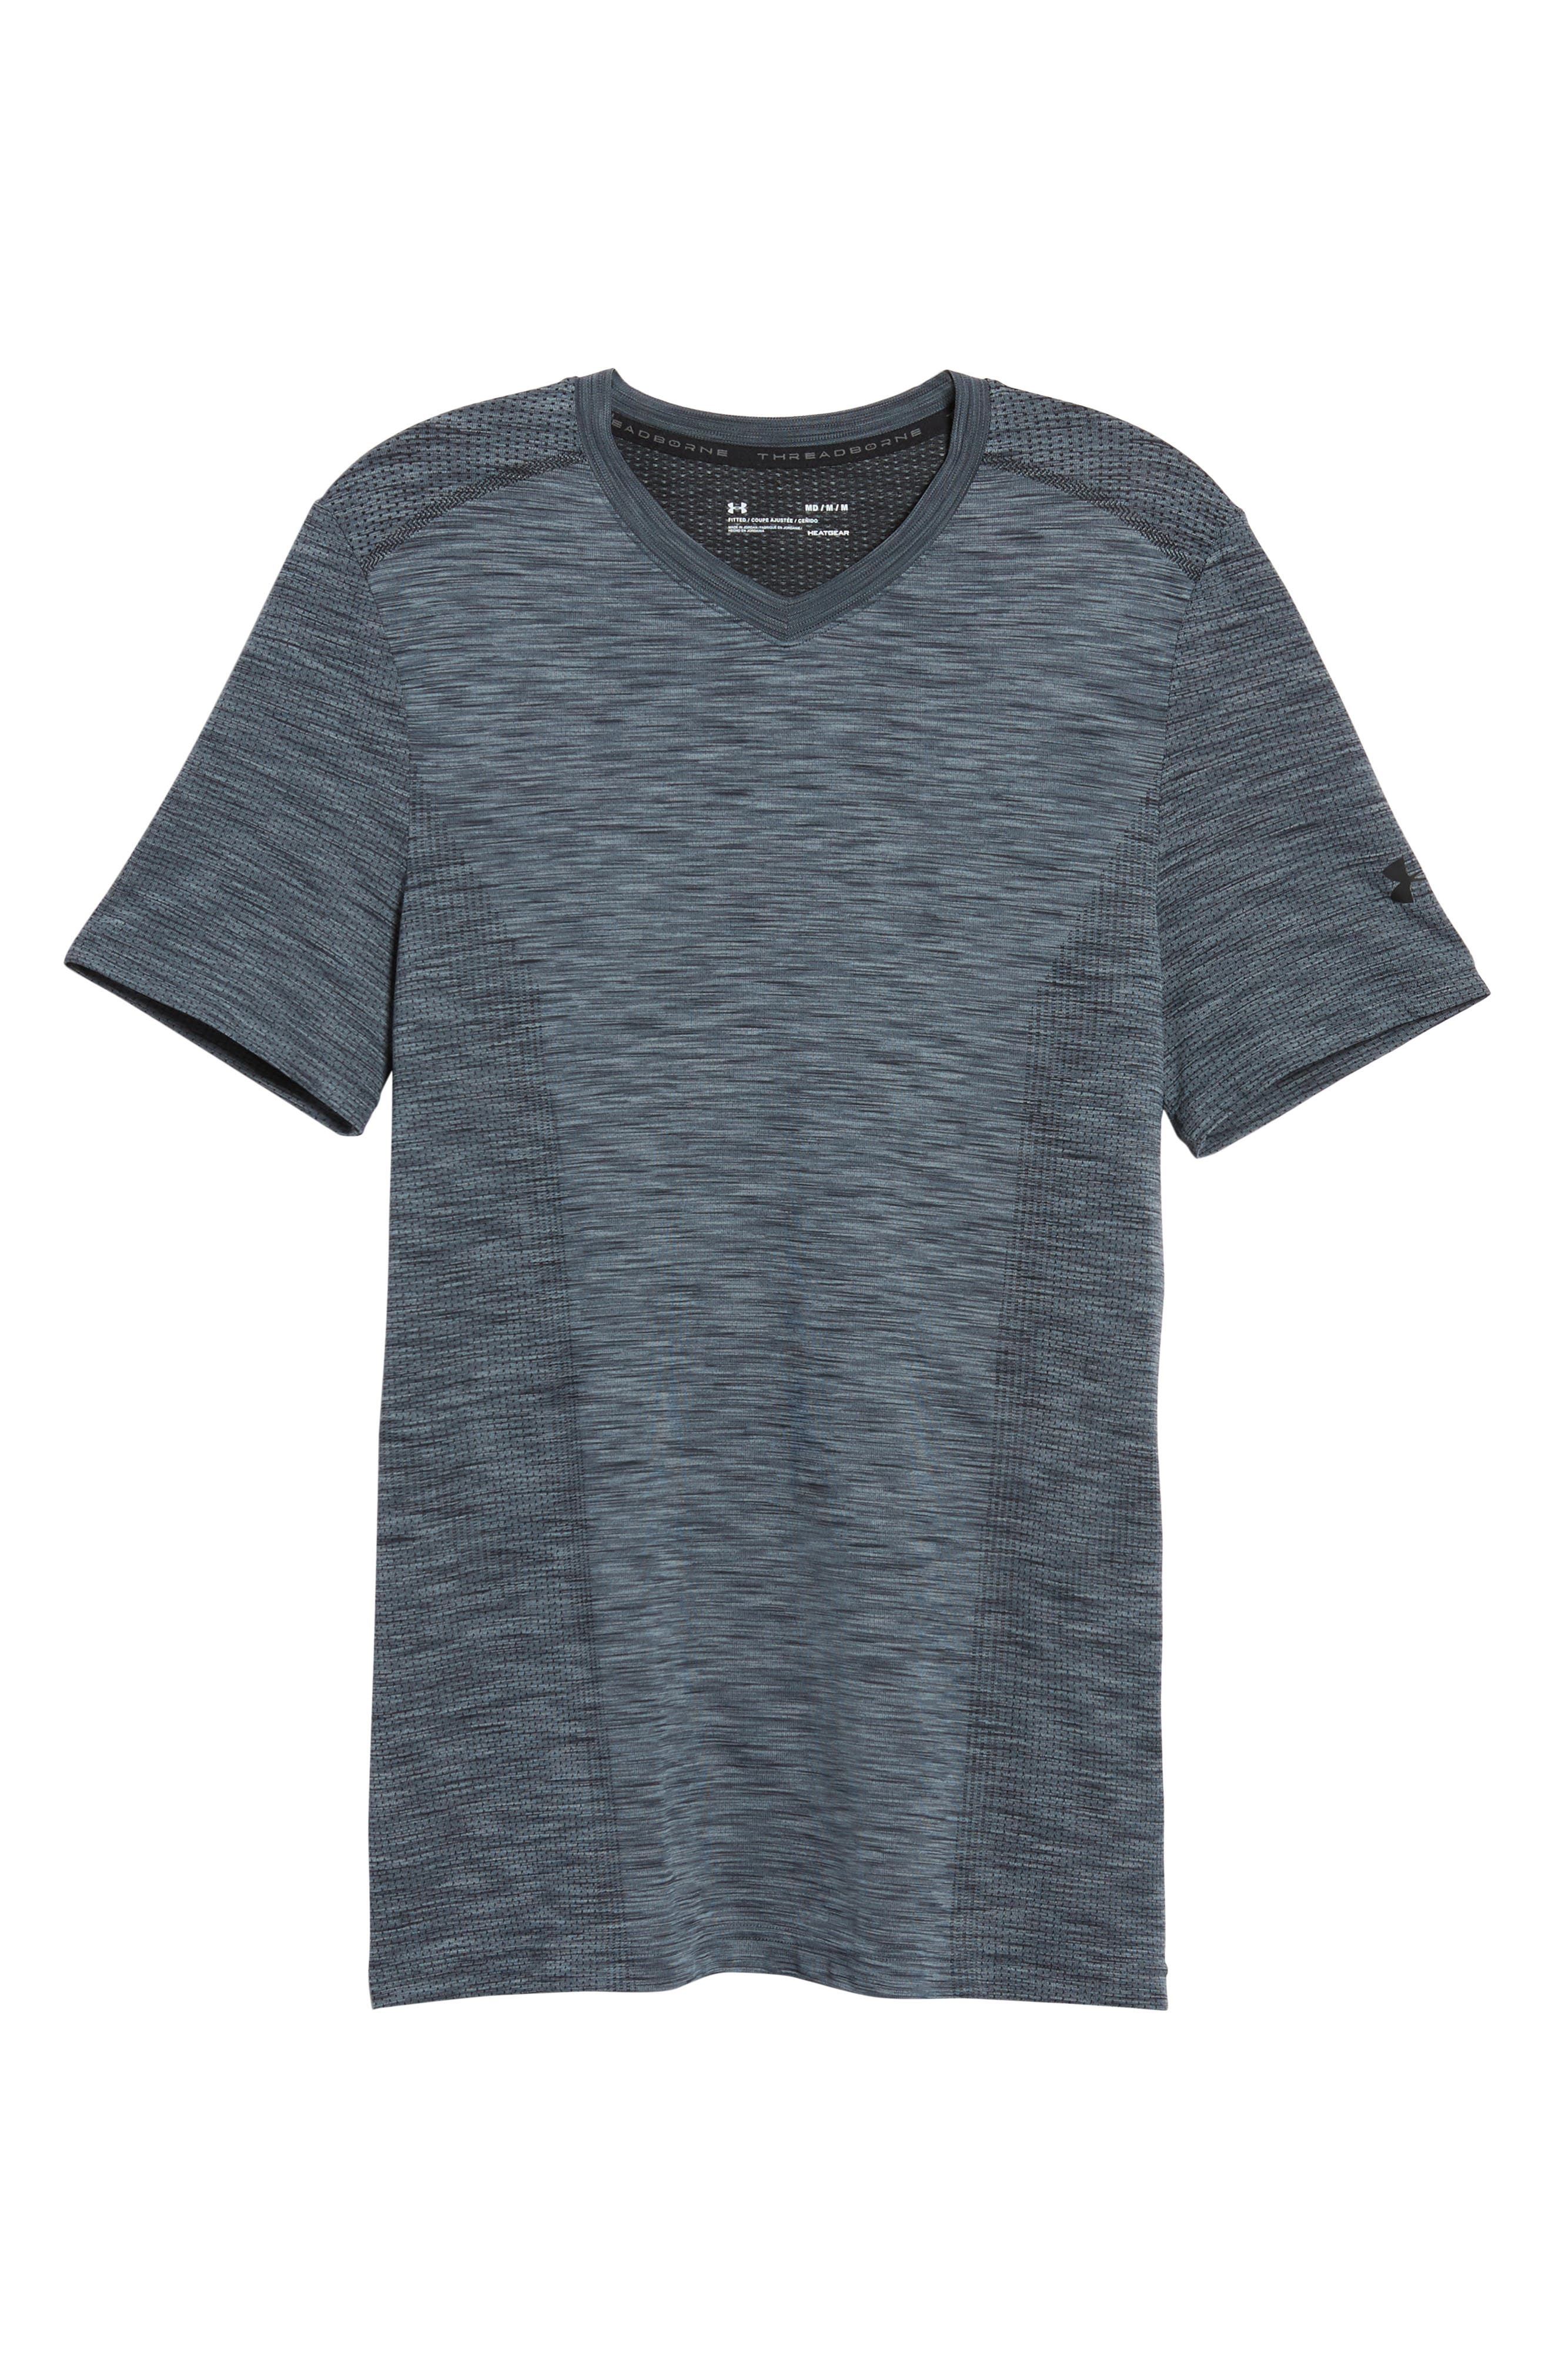 Regular Fit Threadborne T-Shirt,                             Alternate thumbnail 6, color,                             GRAPHITE/ BLACK